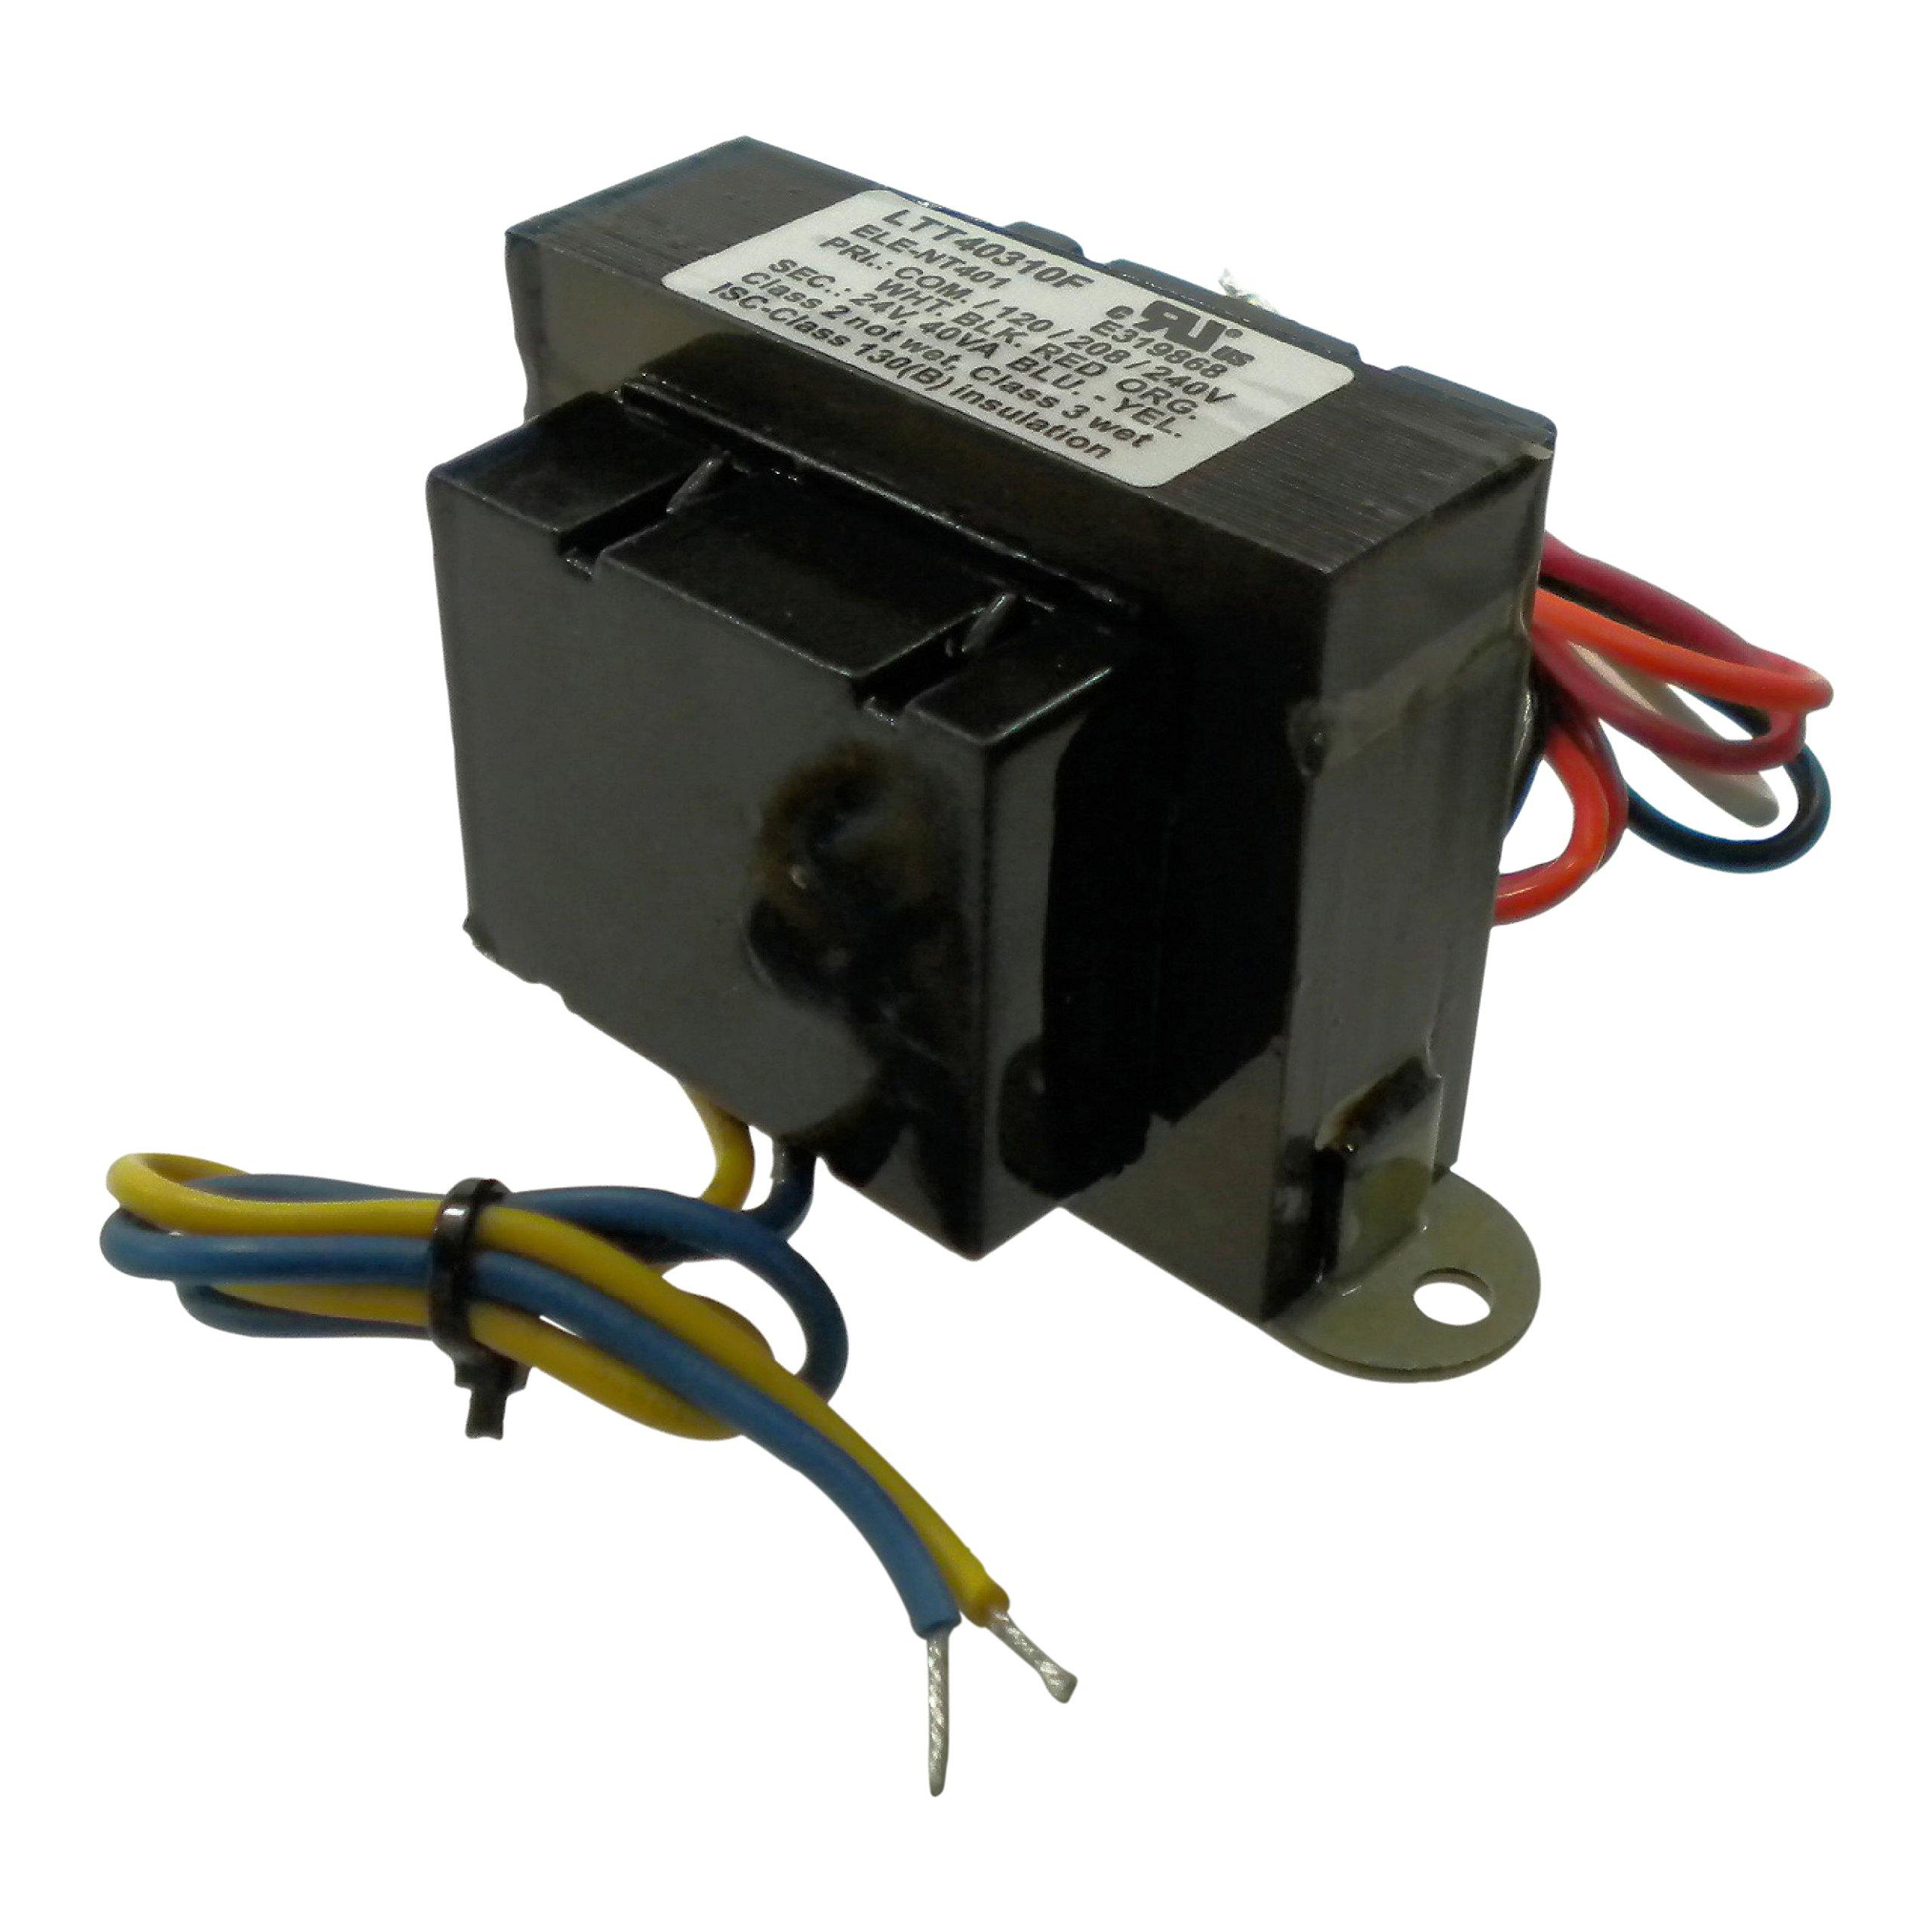 Protactor Universal Furnace Transformer 115-208-240 Volt Primary 24 Volt Secondary 40 VA